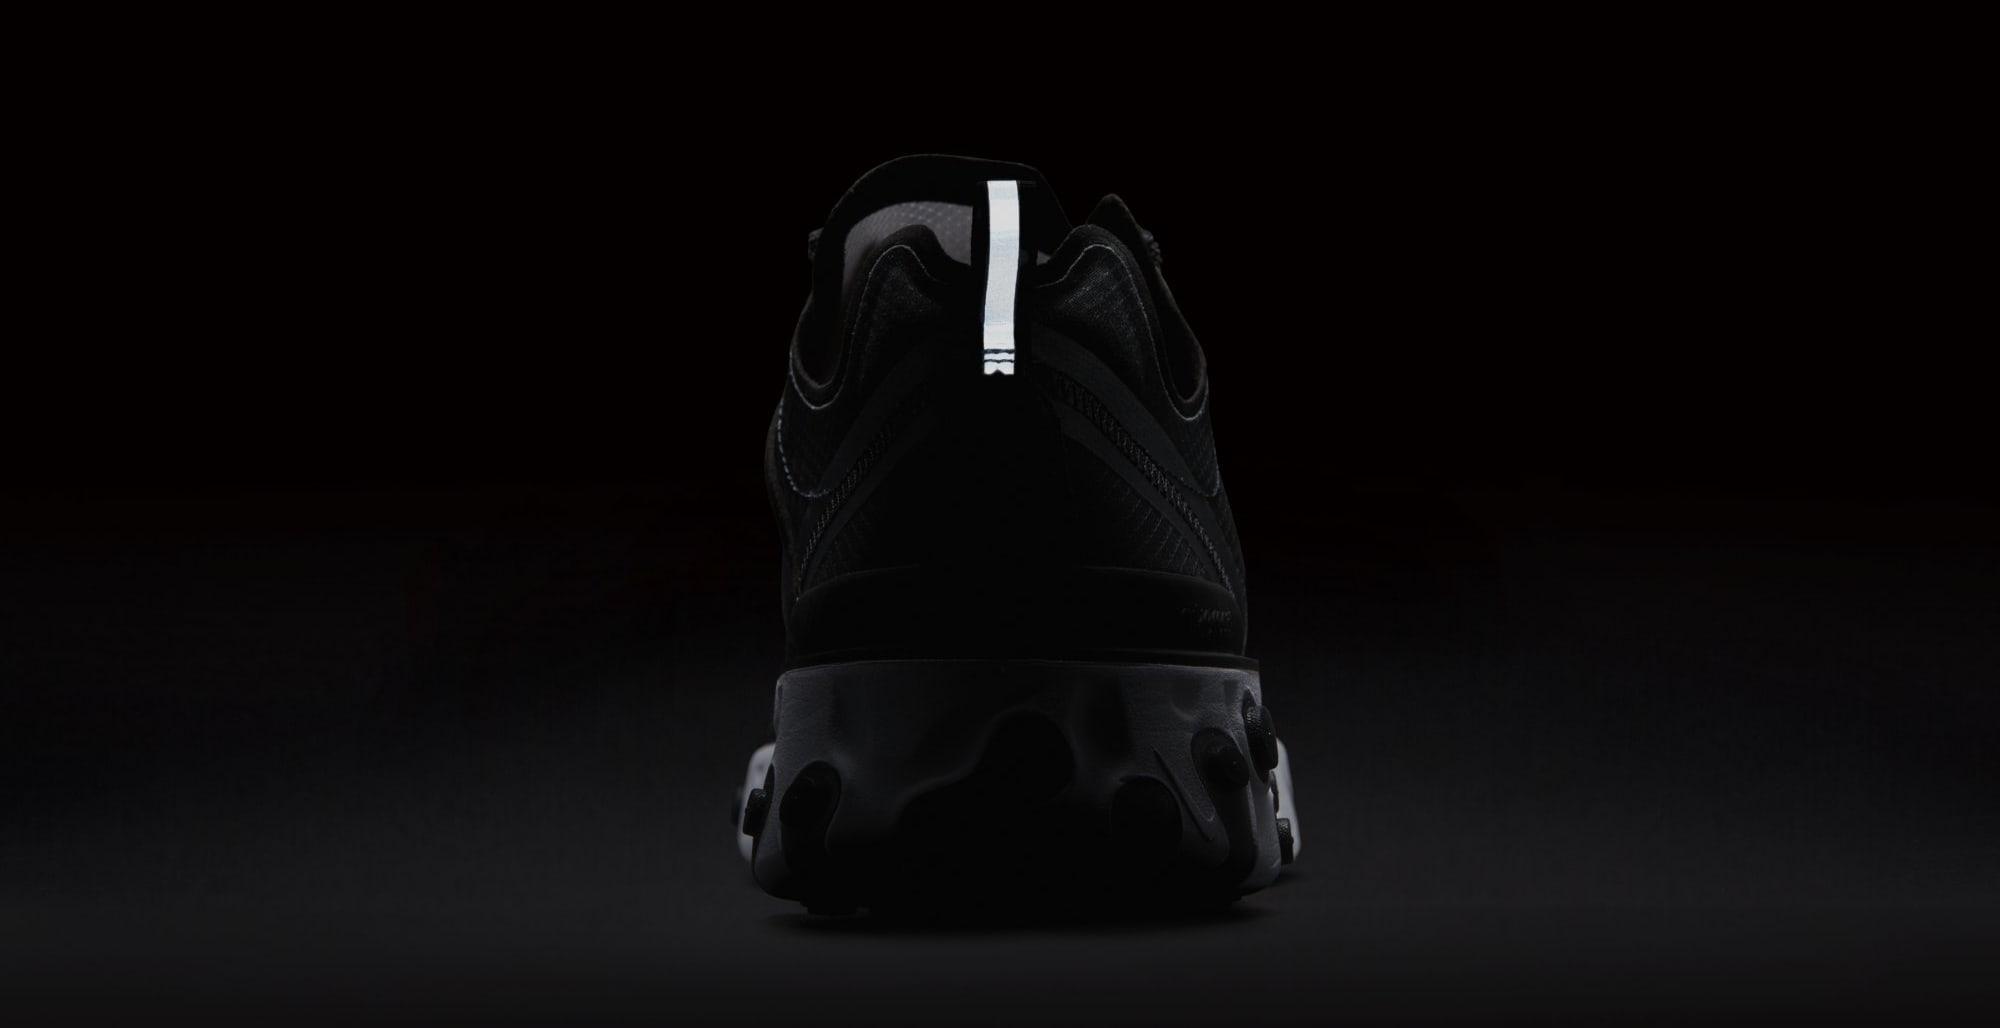 Nike React Element 87 'Anthracite/Black/White' AQ1090-001 (Reflective)